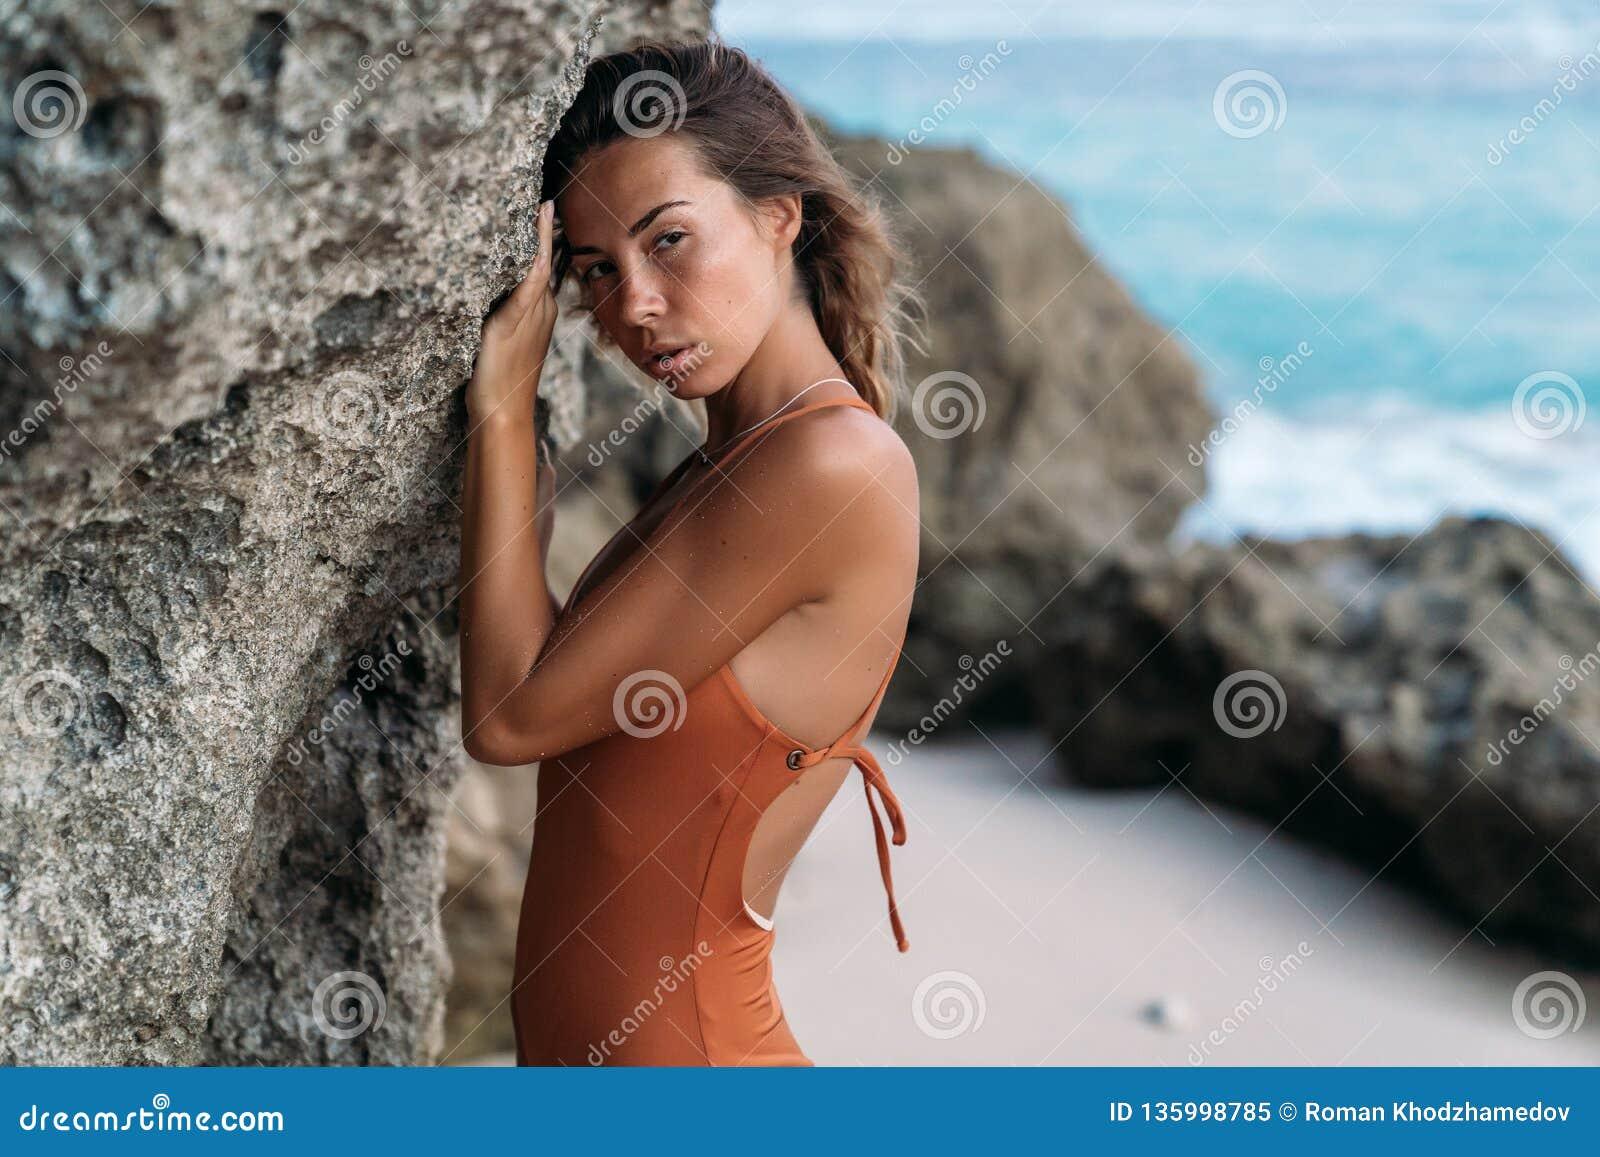 Portrait Of Sensual Tanned Girl In Swimsuit Posing Near Rock On Beach